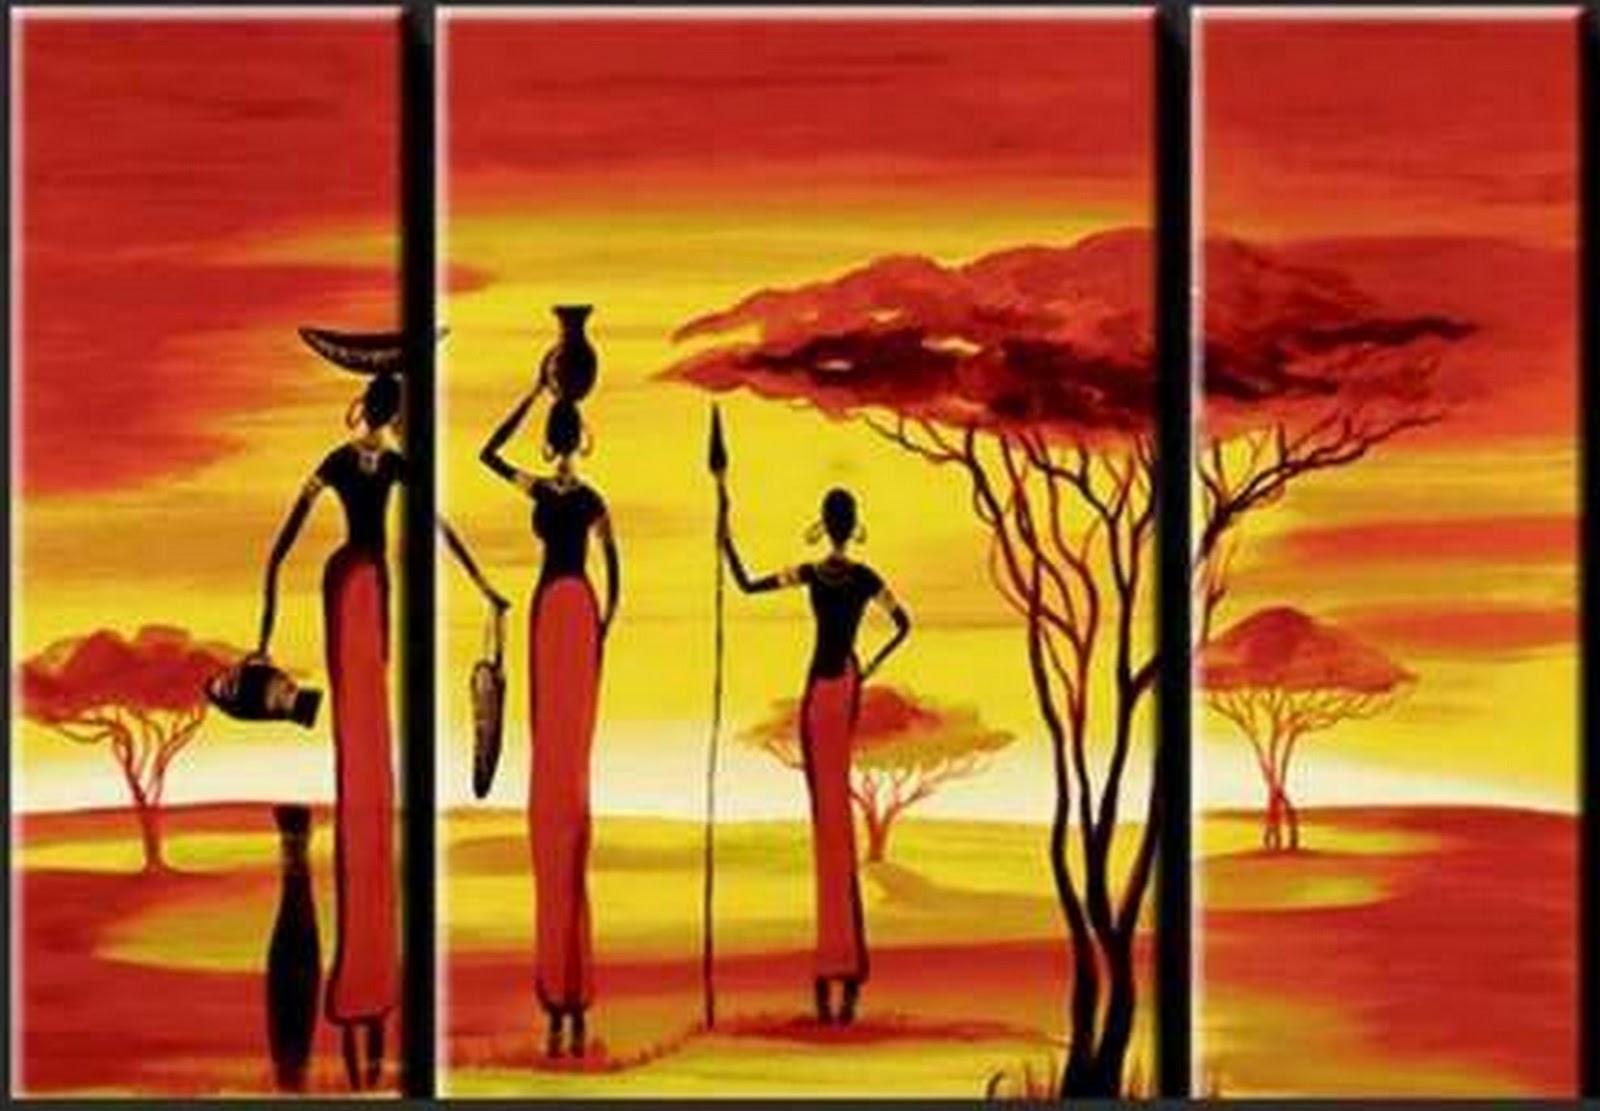 Cuadros Paisajes Africanos | imagendepaisaje website